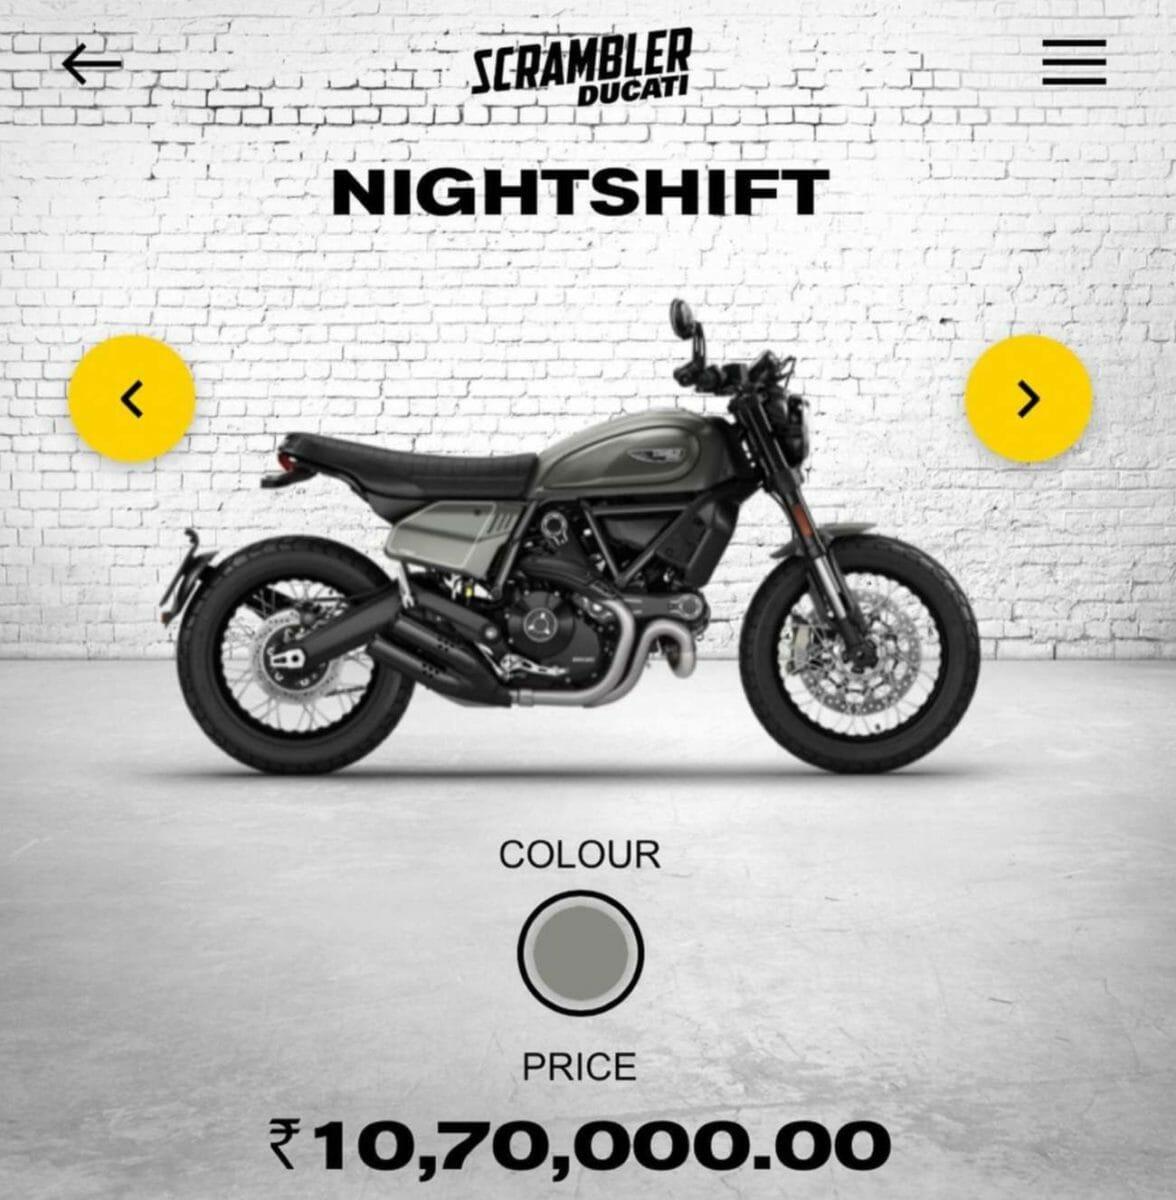 Ducati Scrambler 800 price